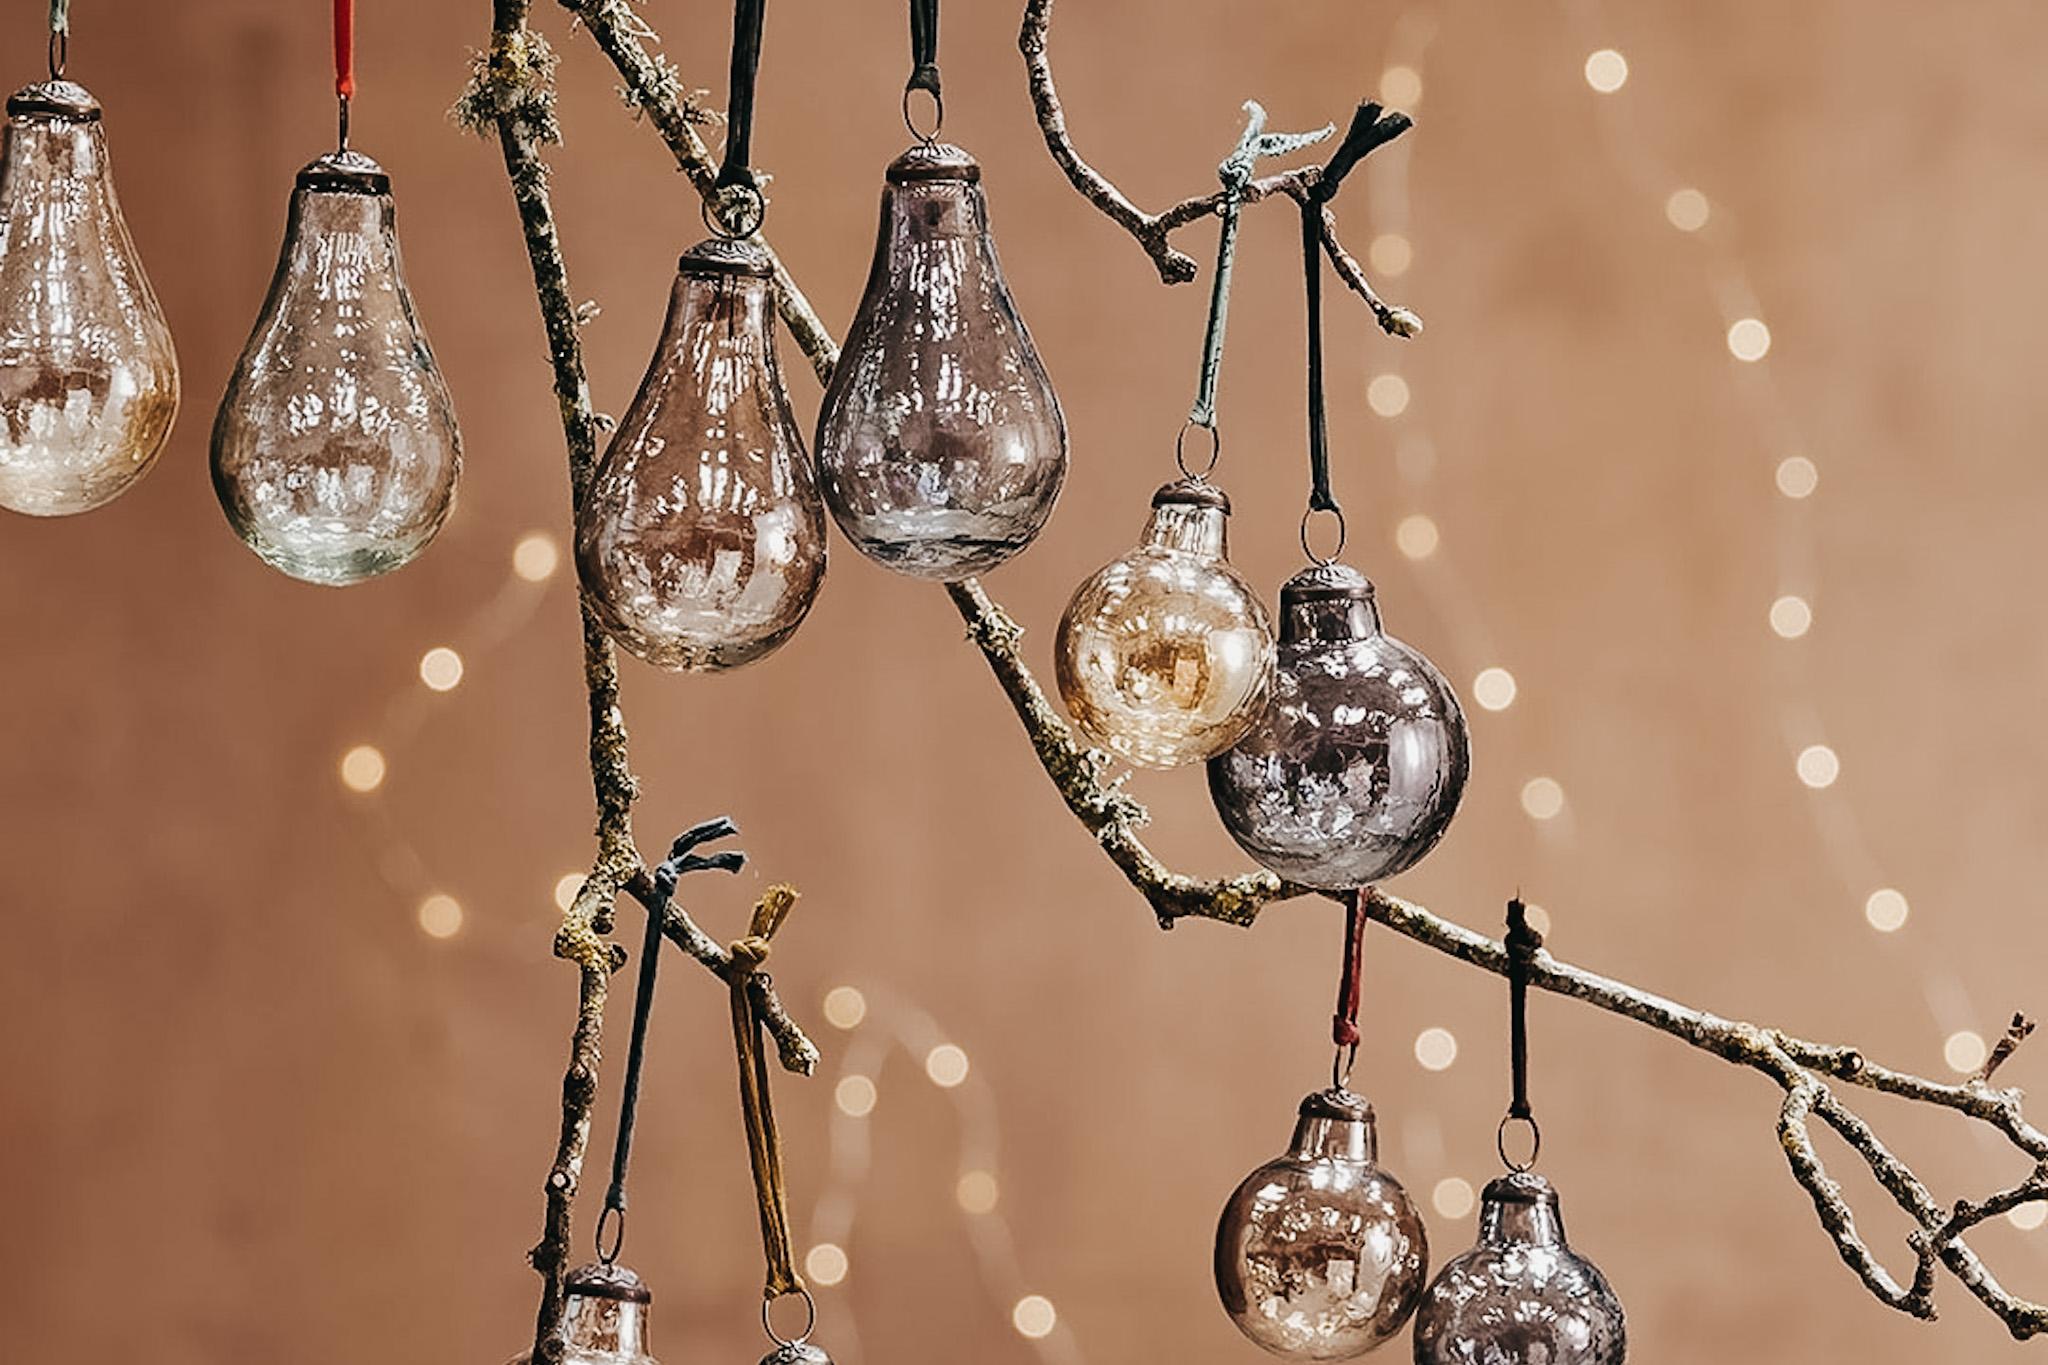 eco-friendly-gift-guide-Andreea-Prodan-cover LIFESTYLE